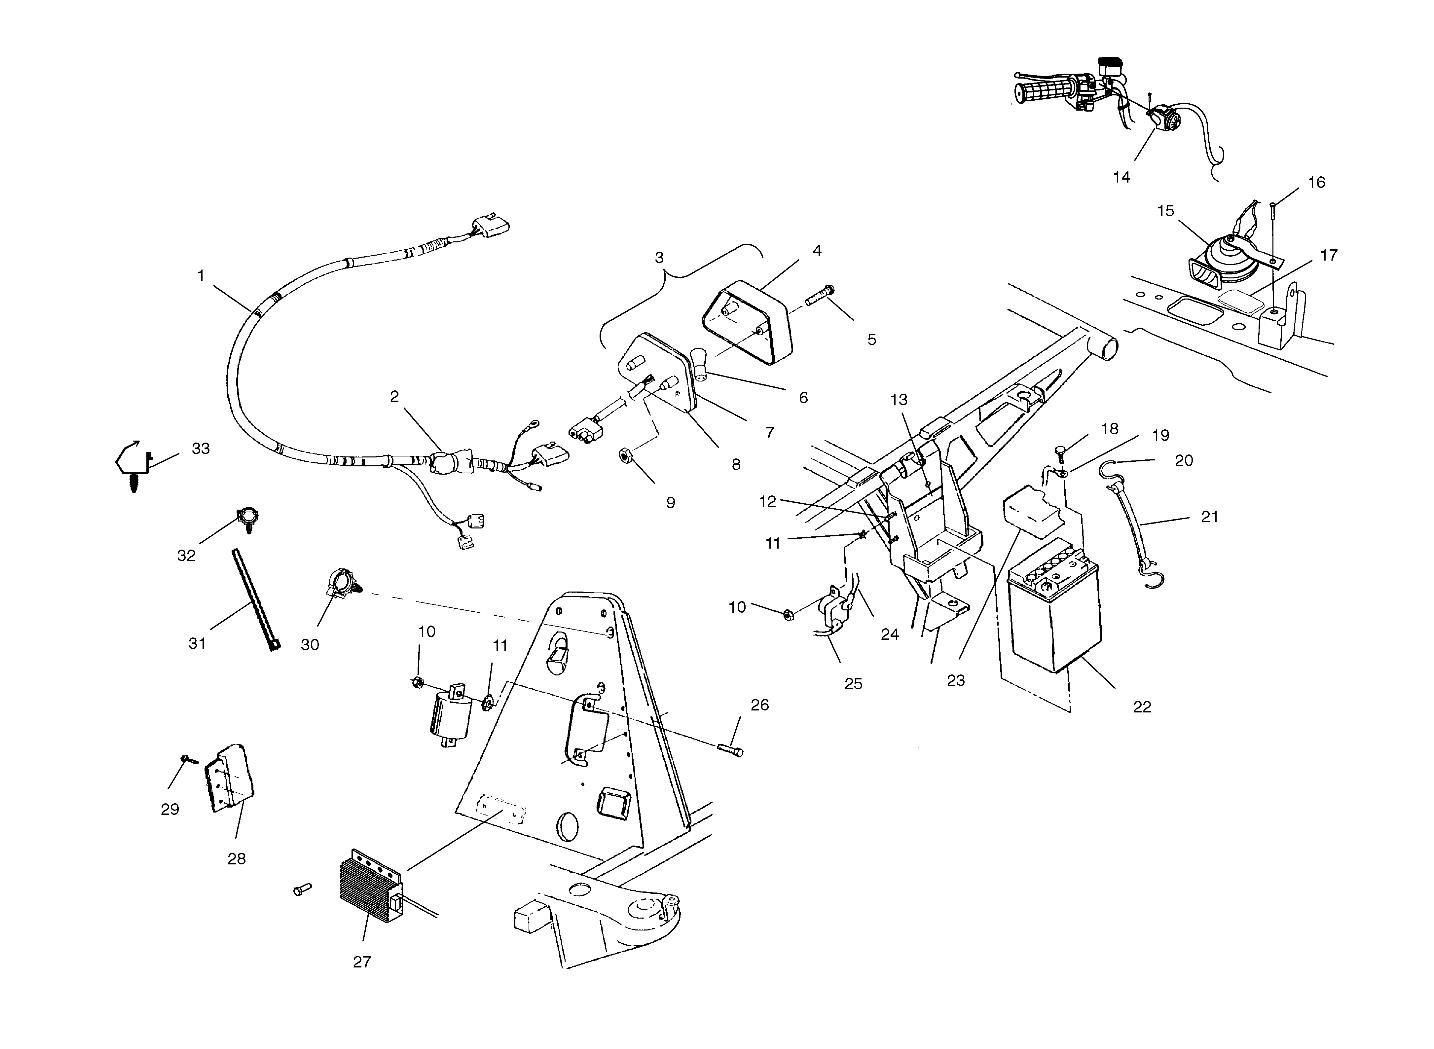 Co Schematics Polaris Trail Boss Wiring Diagram